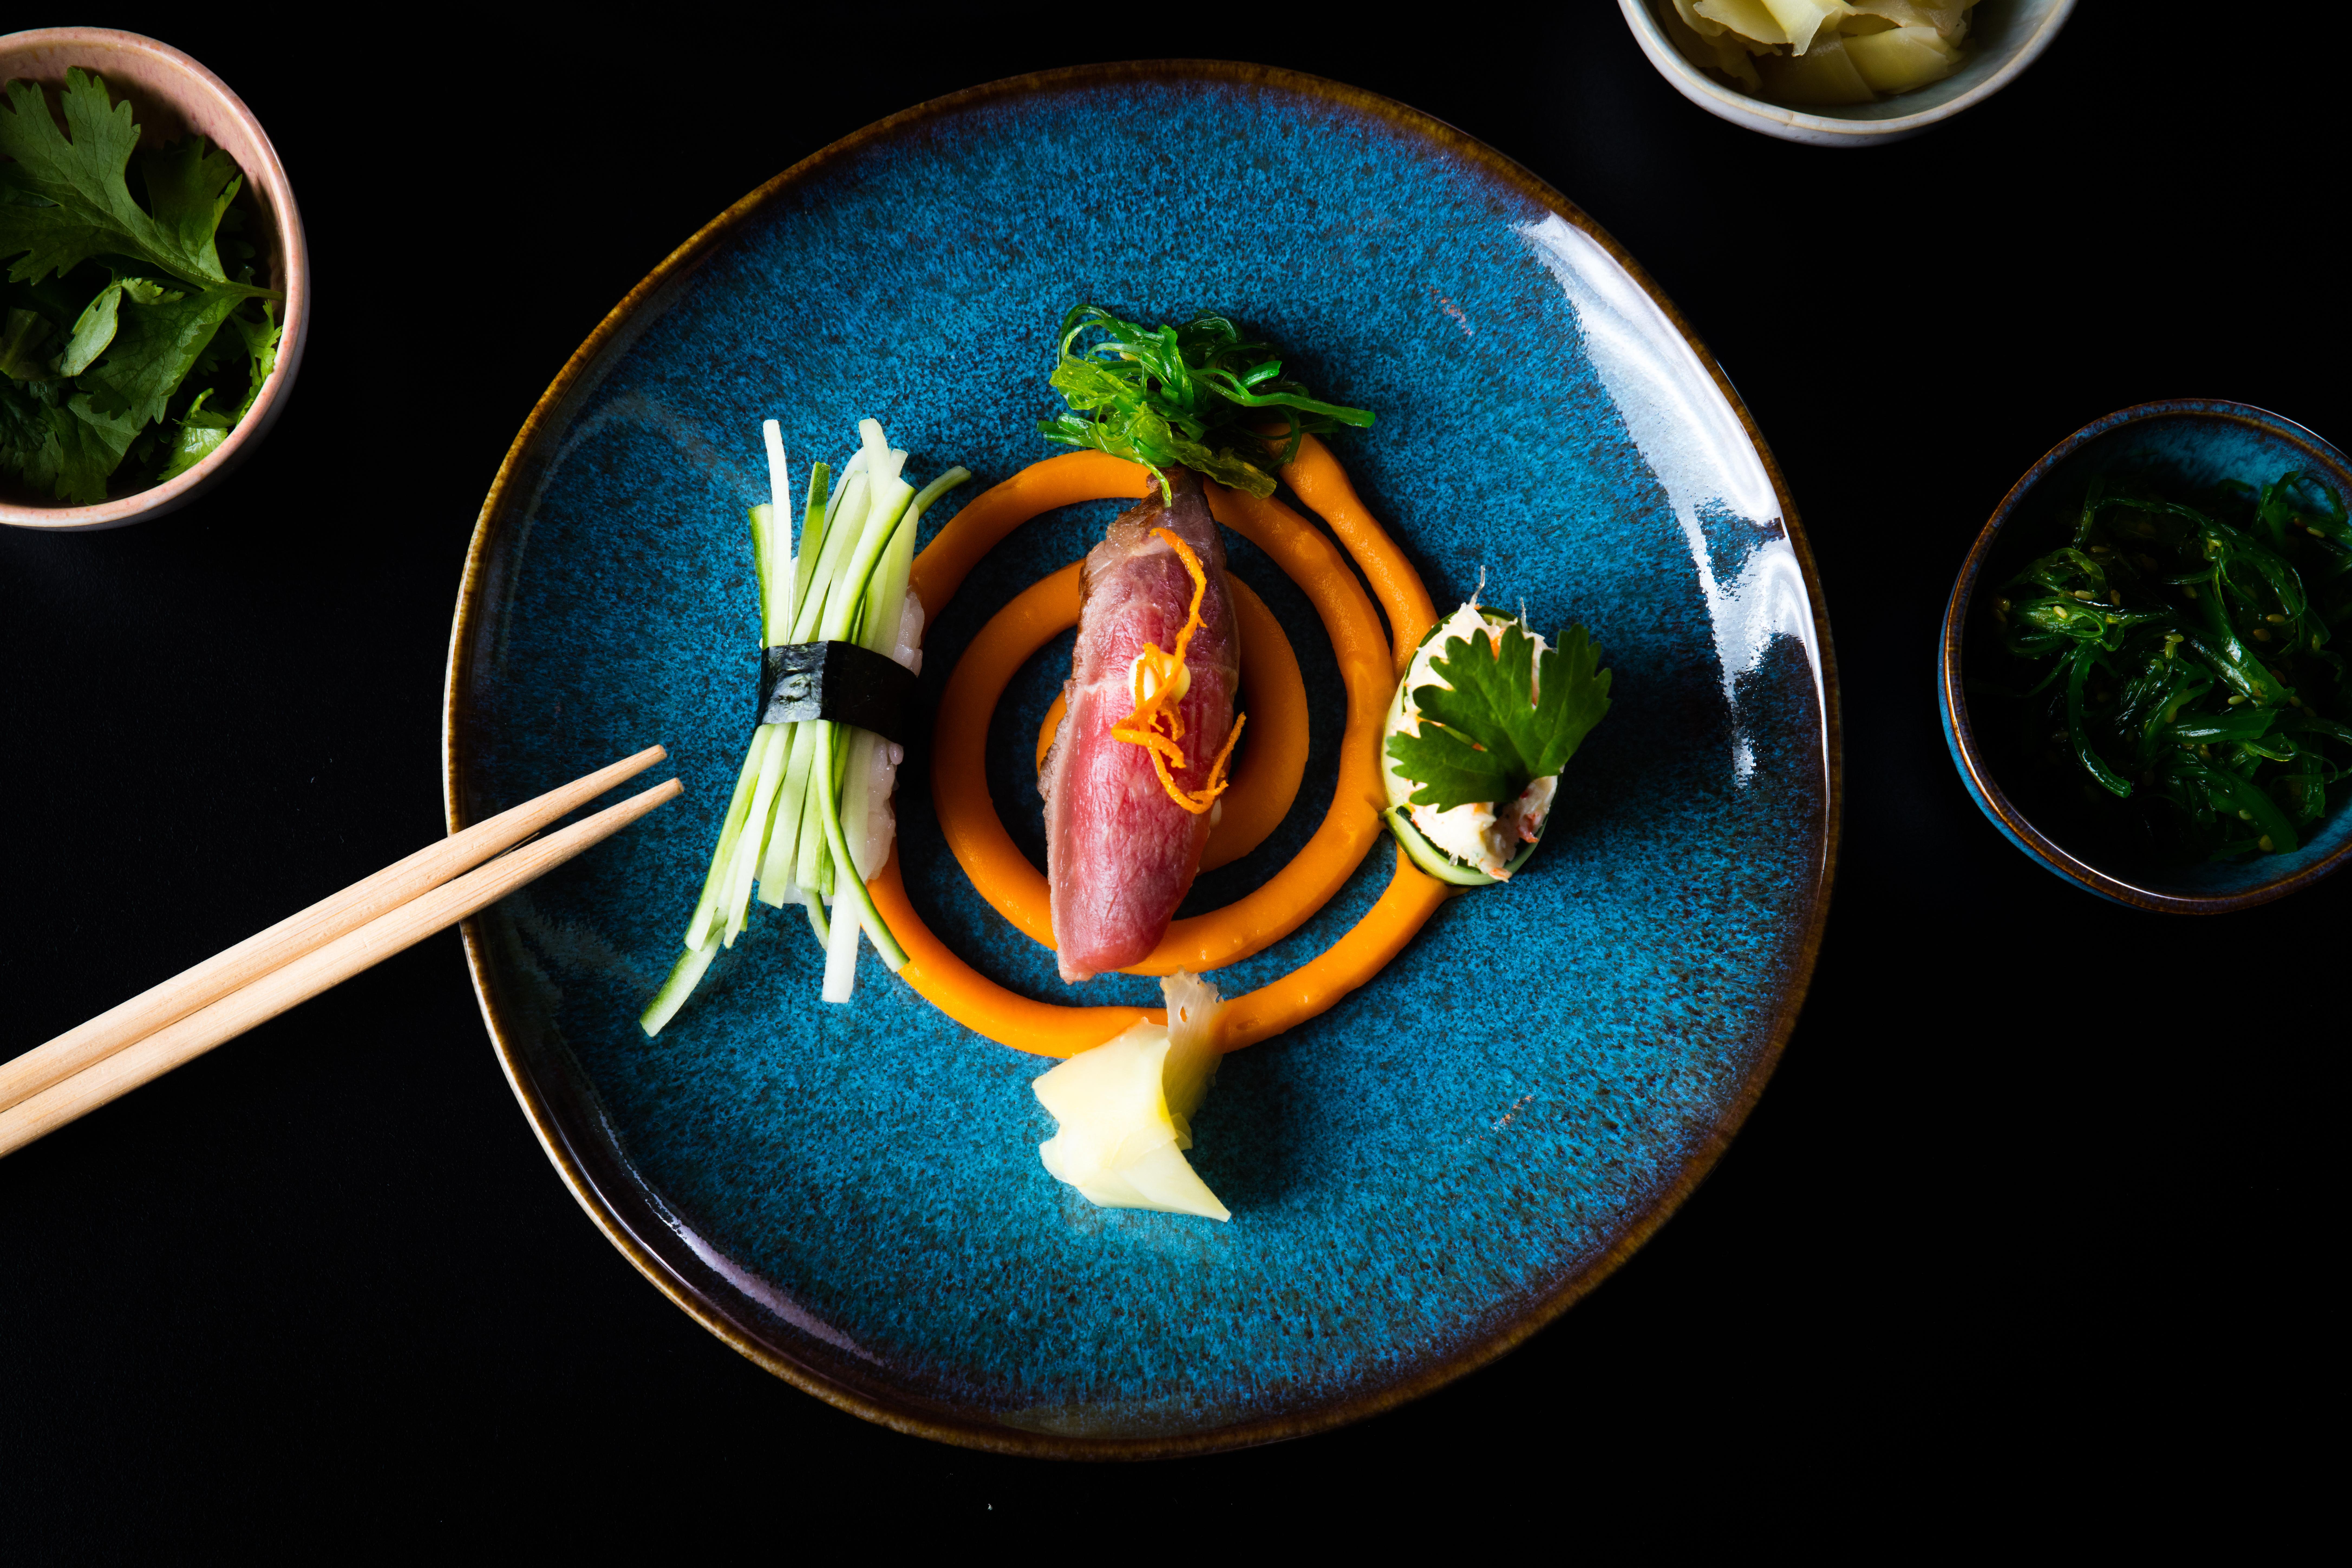 Sushi-22 Incroyable De Table Bar Cuisine Conception